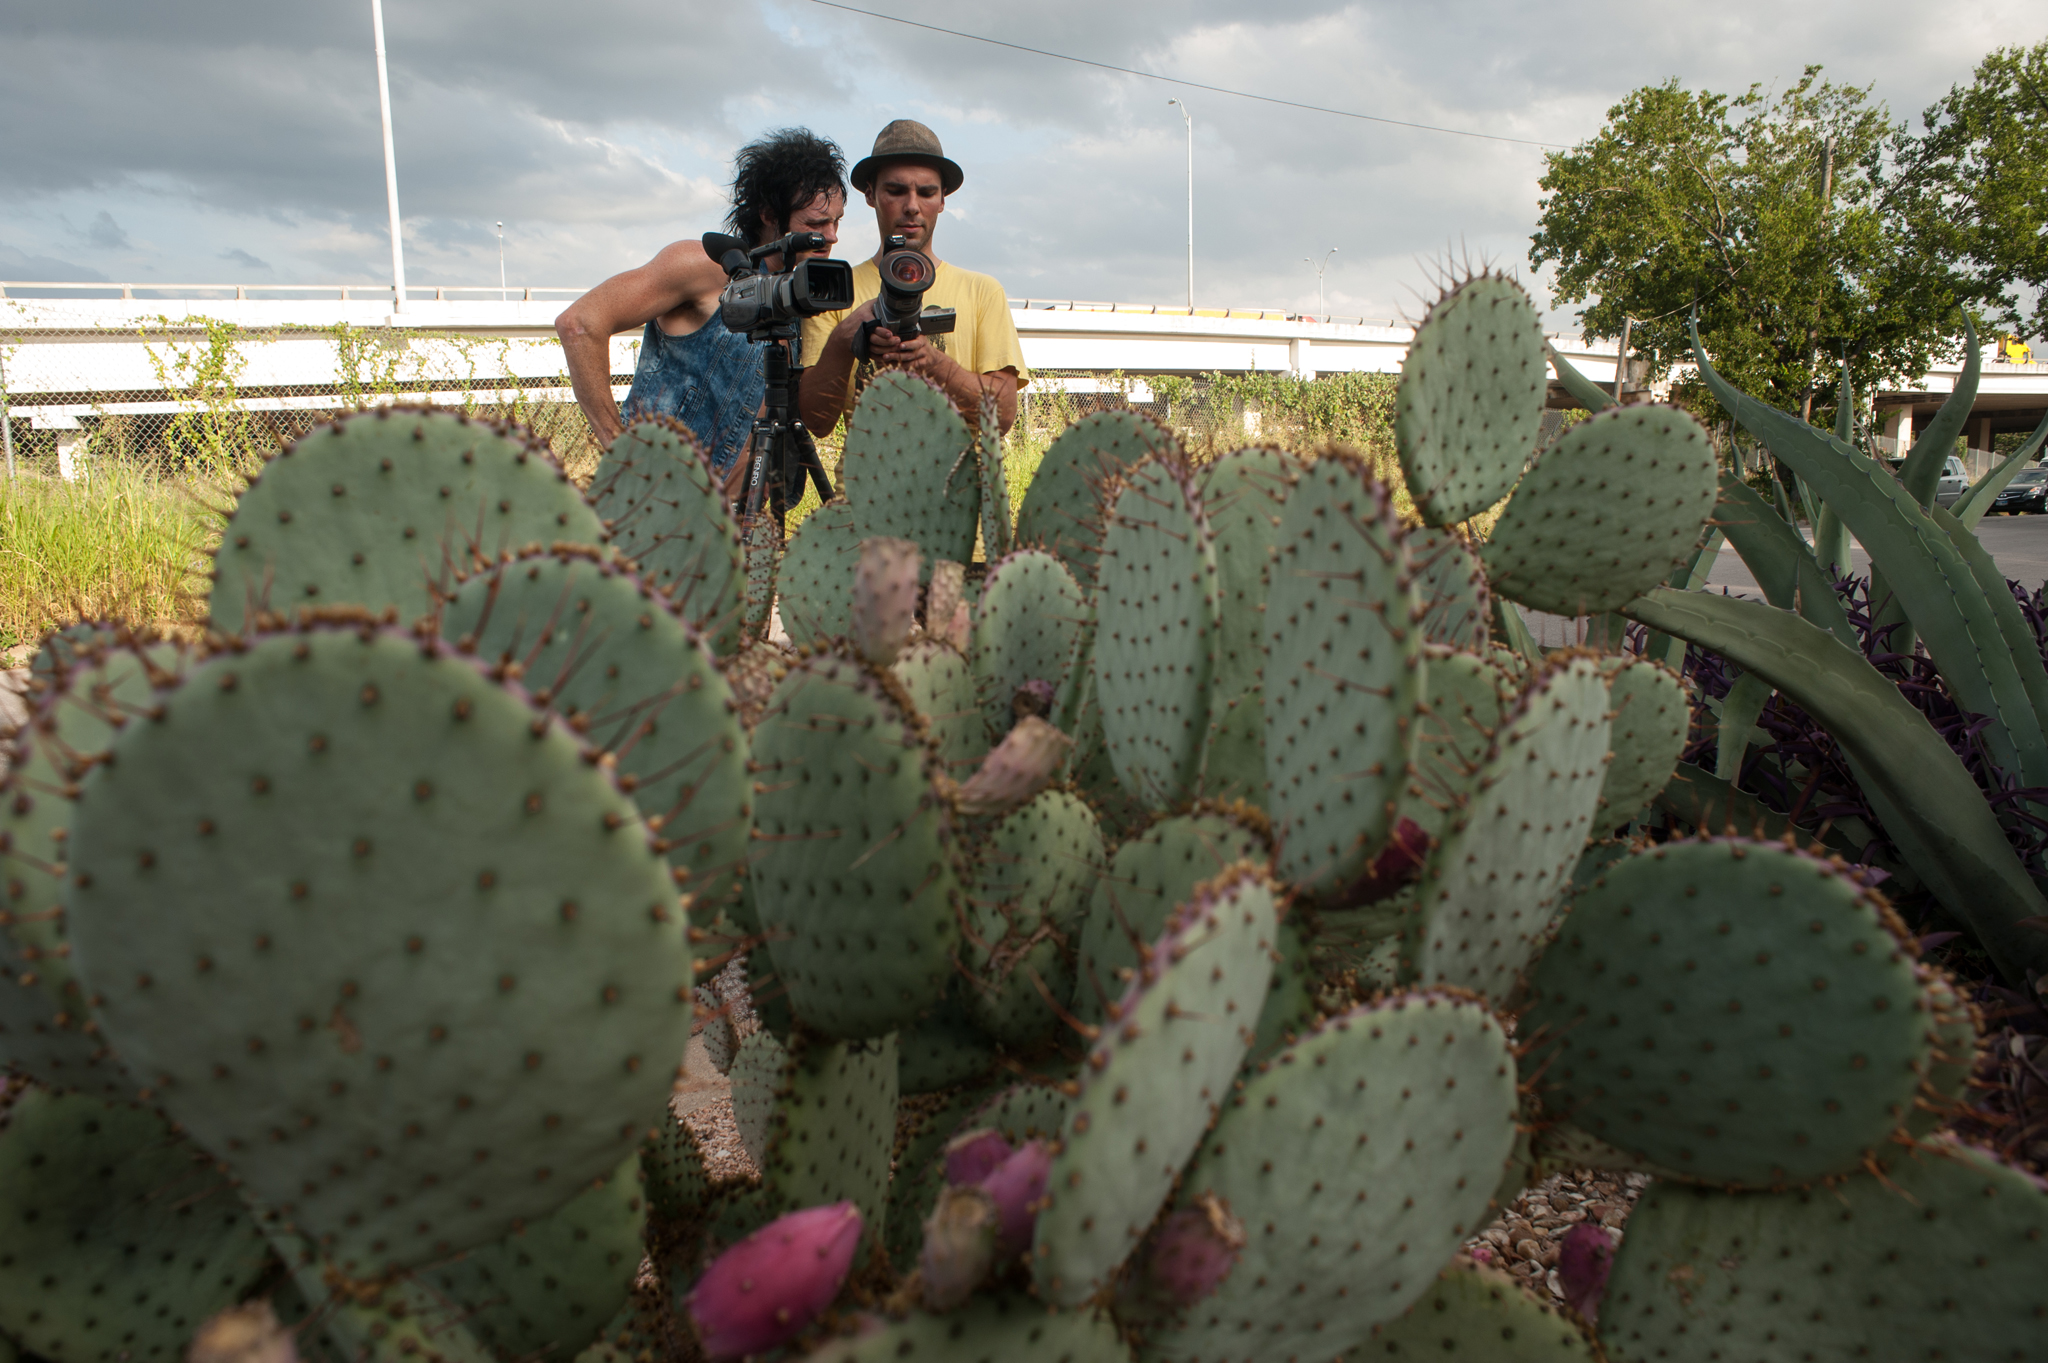 Cacti filming